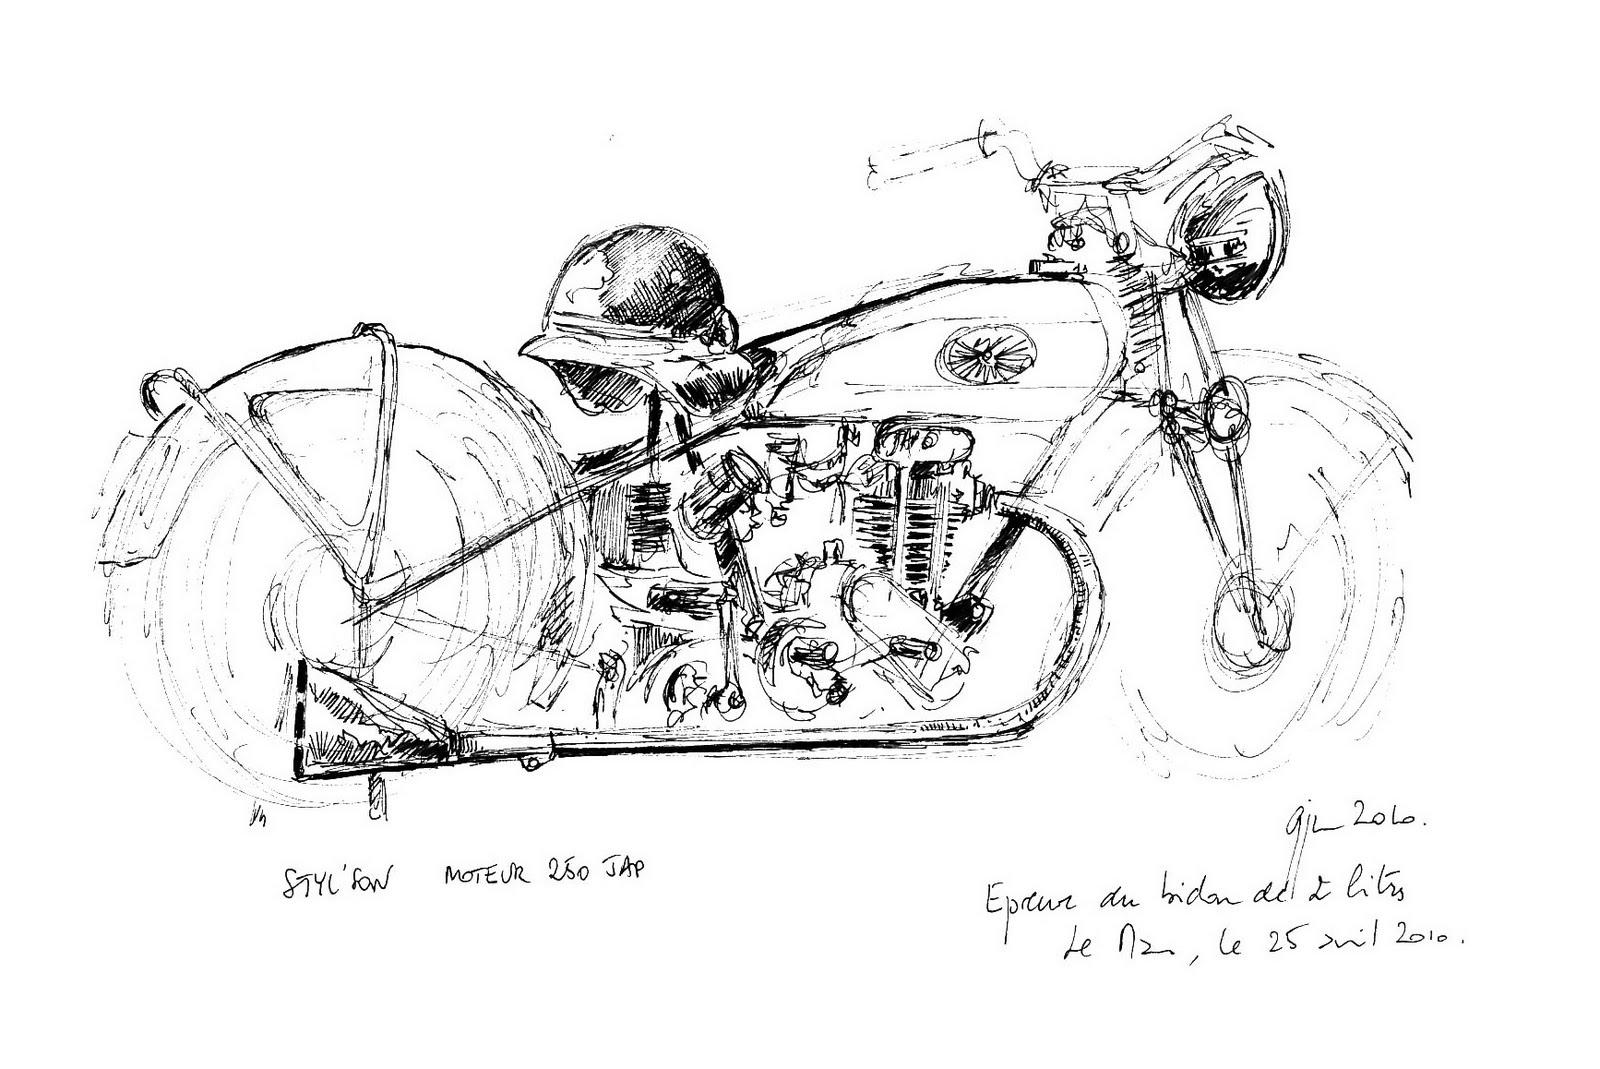 Best Motorcycle: JEAN-MARIE GUIVARC'H